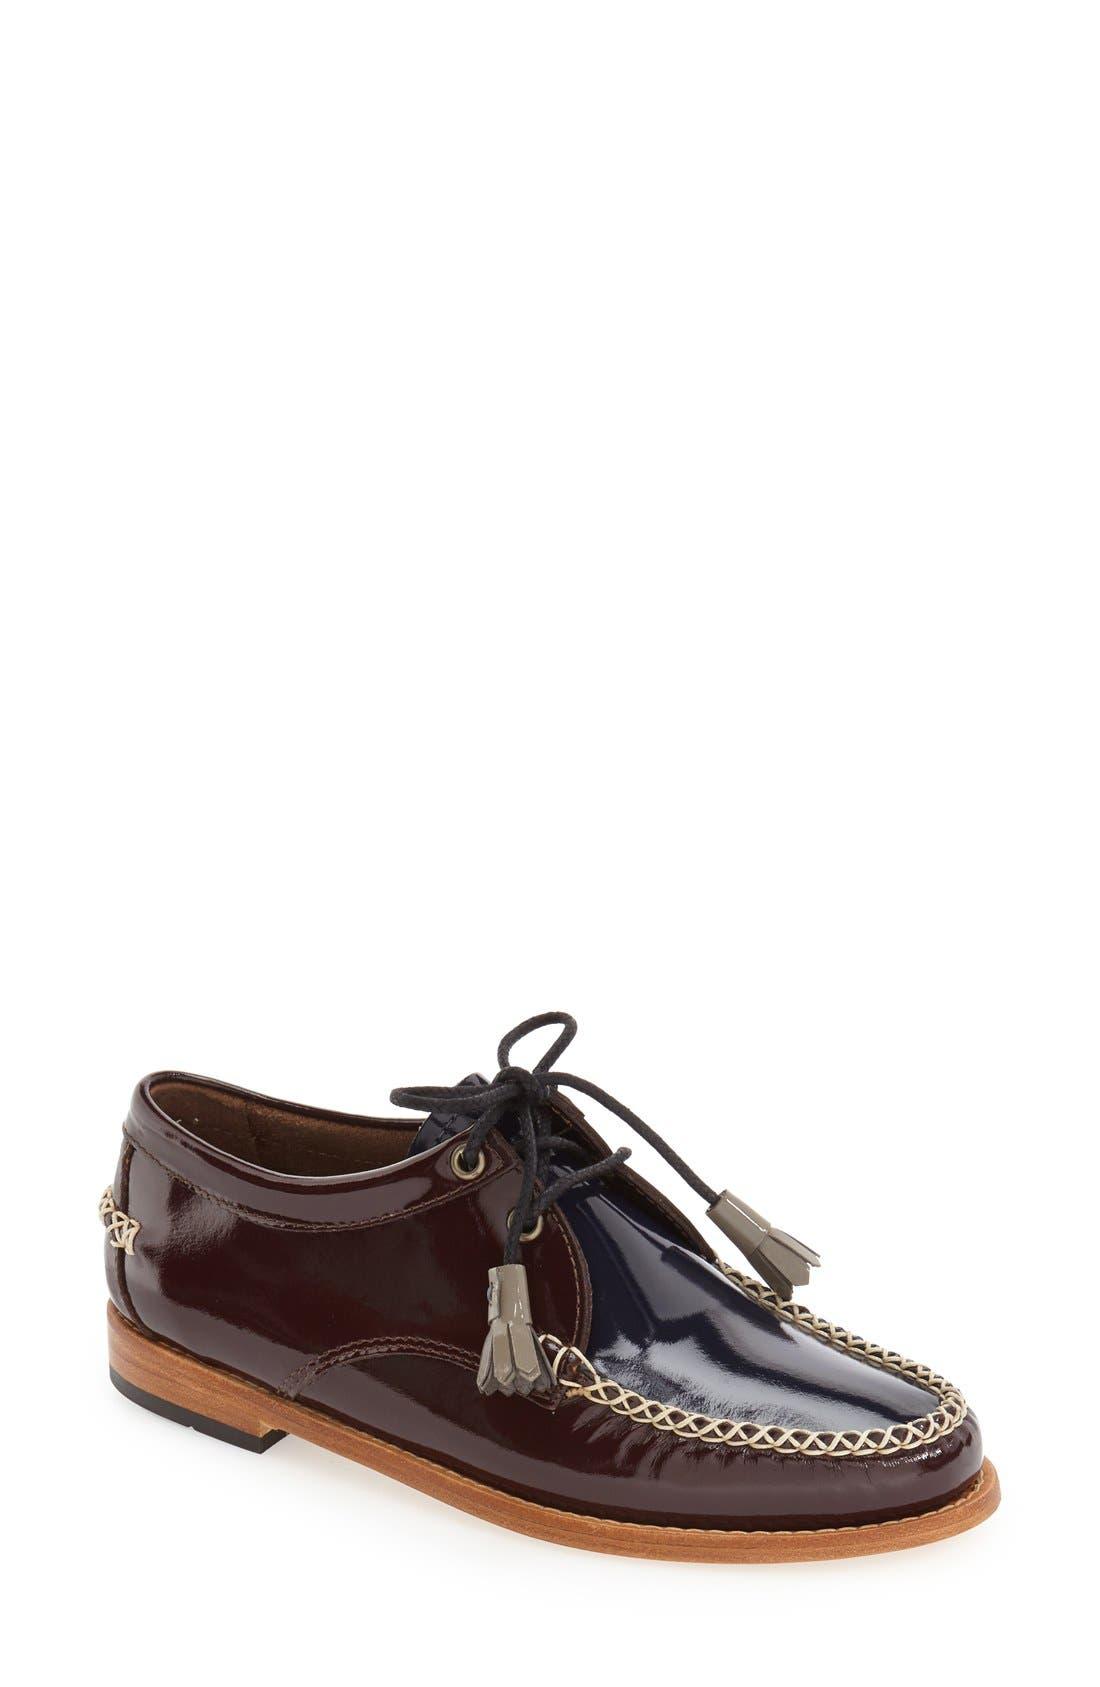 G.H. Bass & Co. 'Winnie' Leather Oxford (Women)